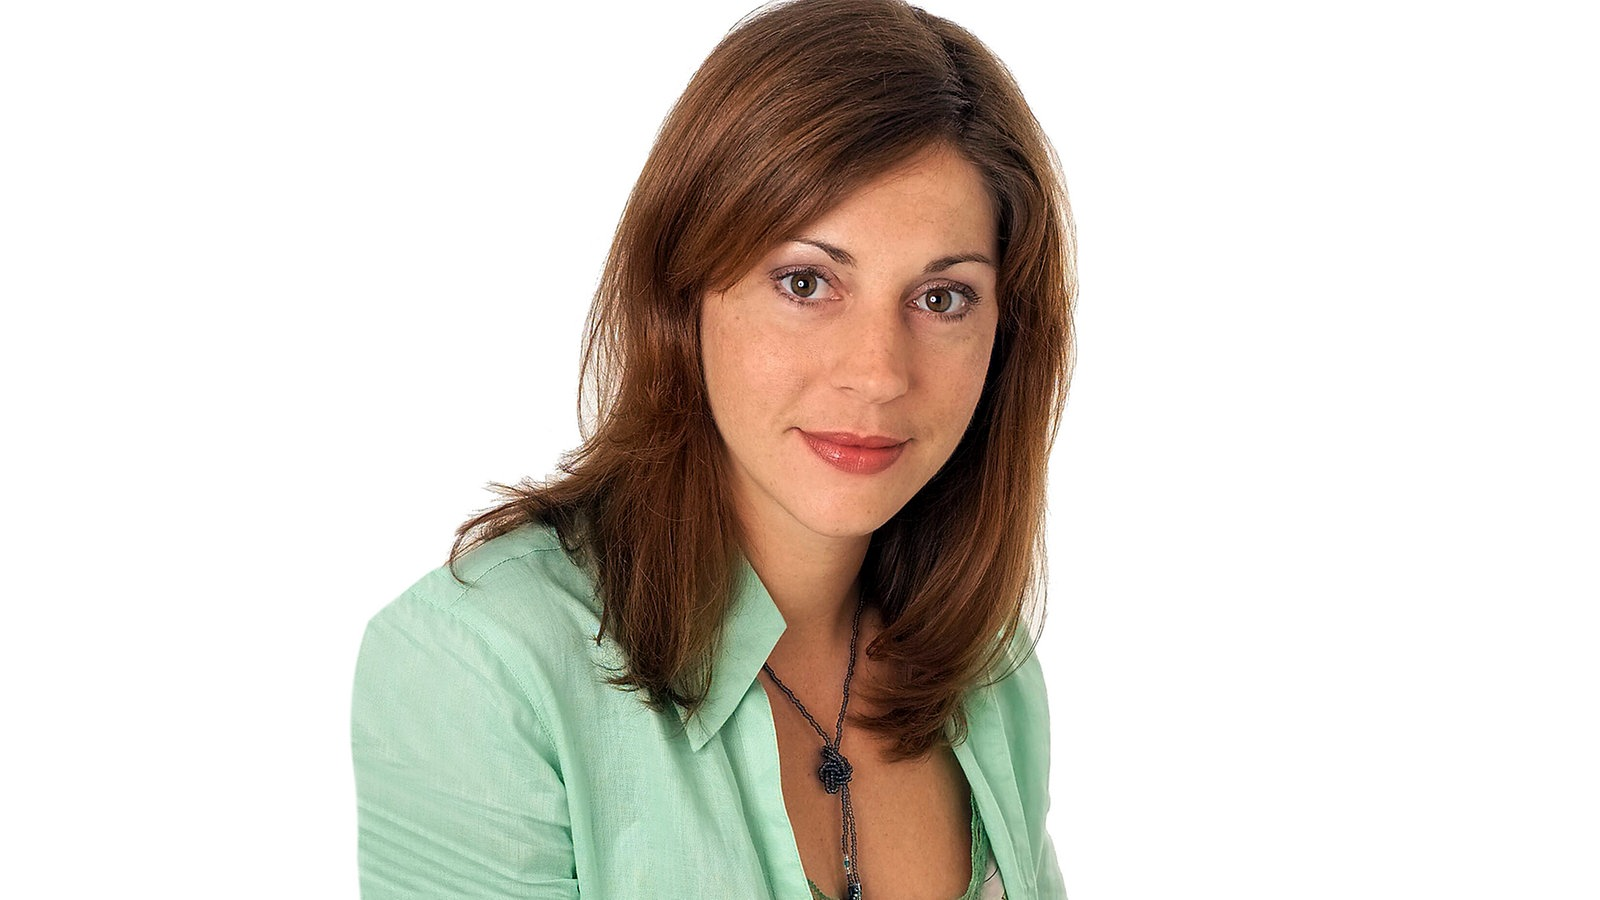 Marion Beimer